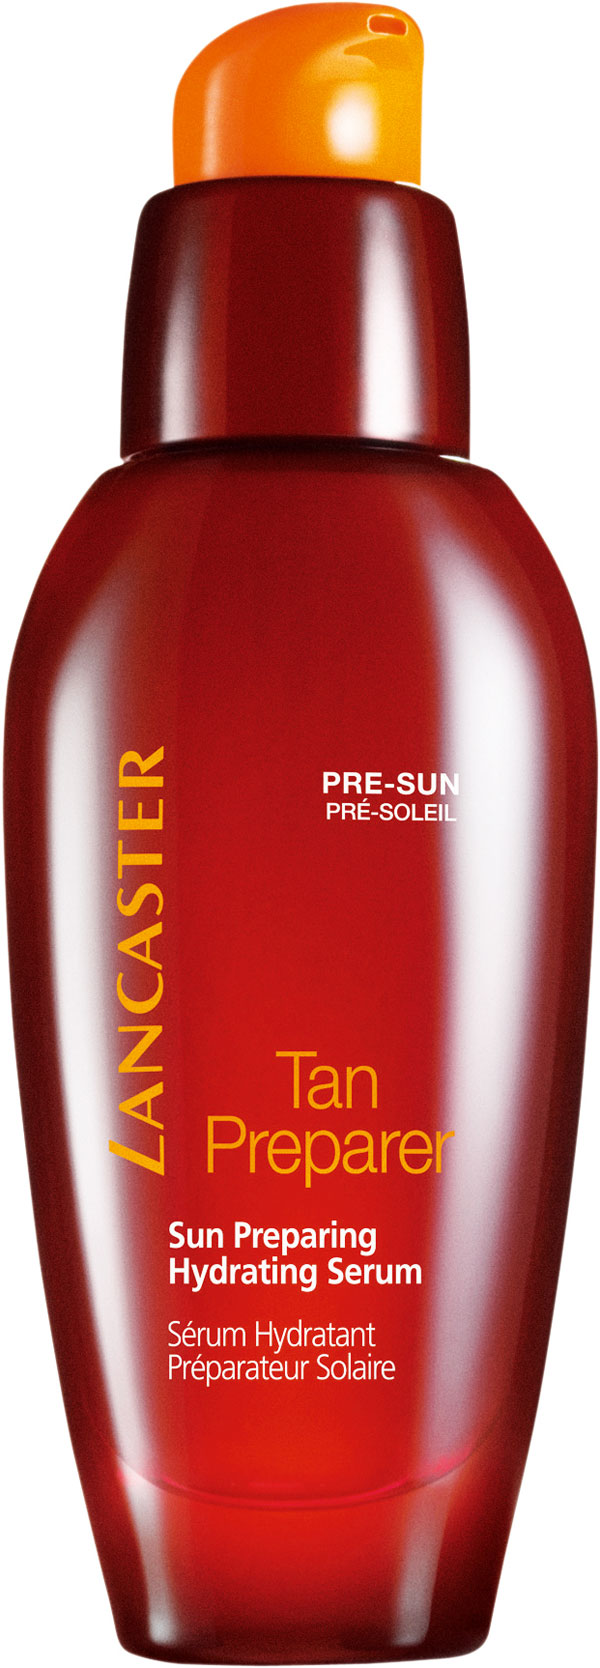 LANCASTER_TAN-PREPARER-SUN-